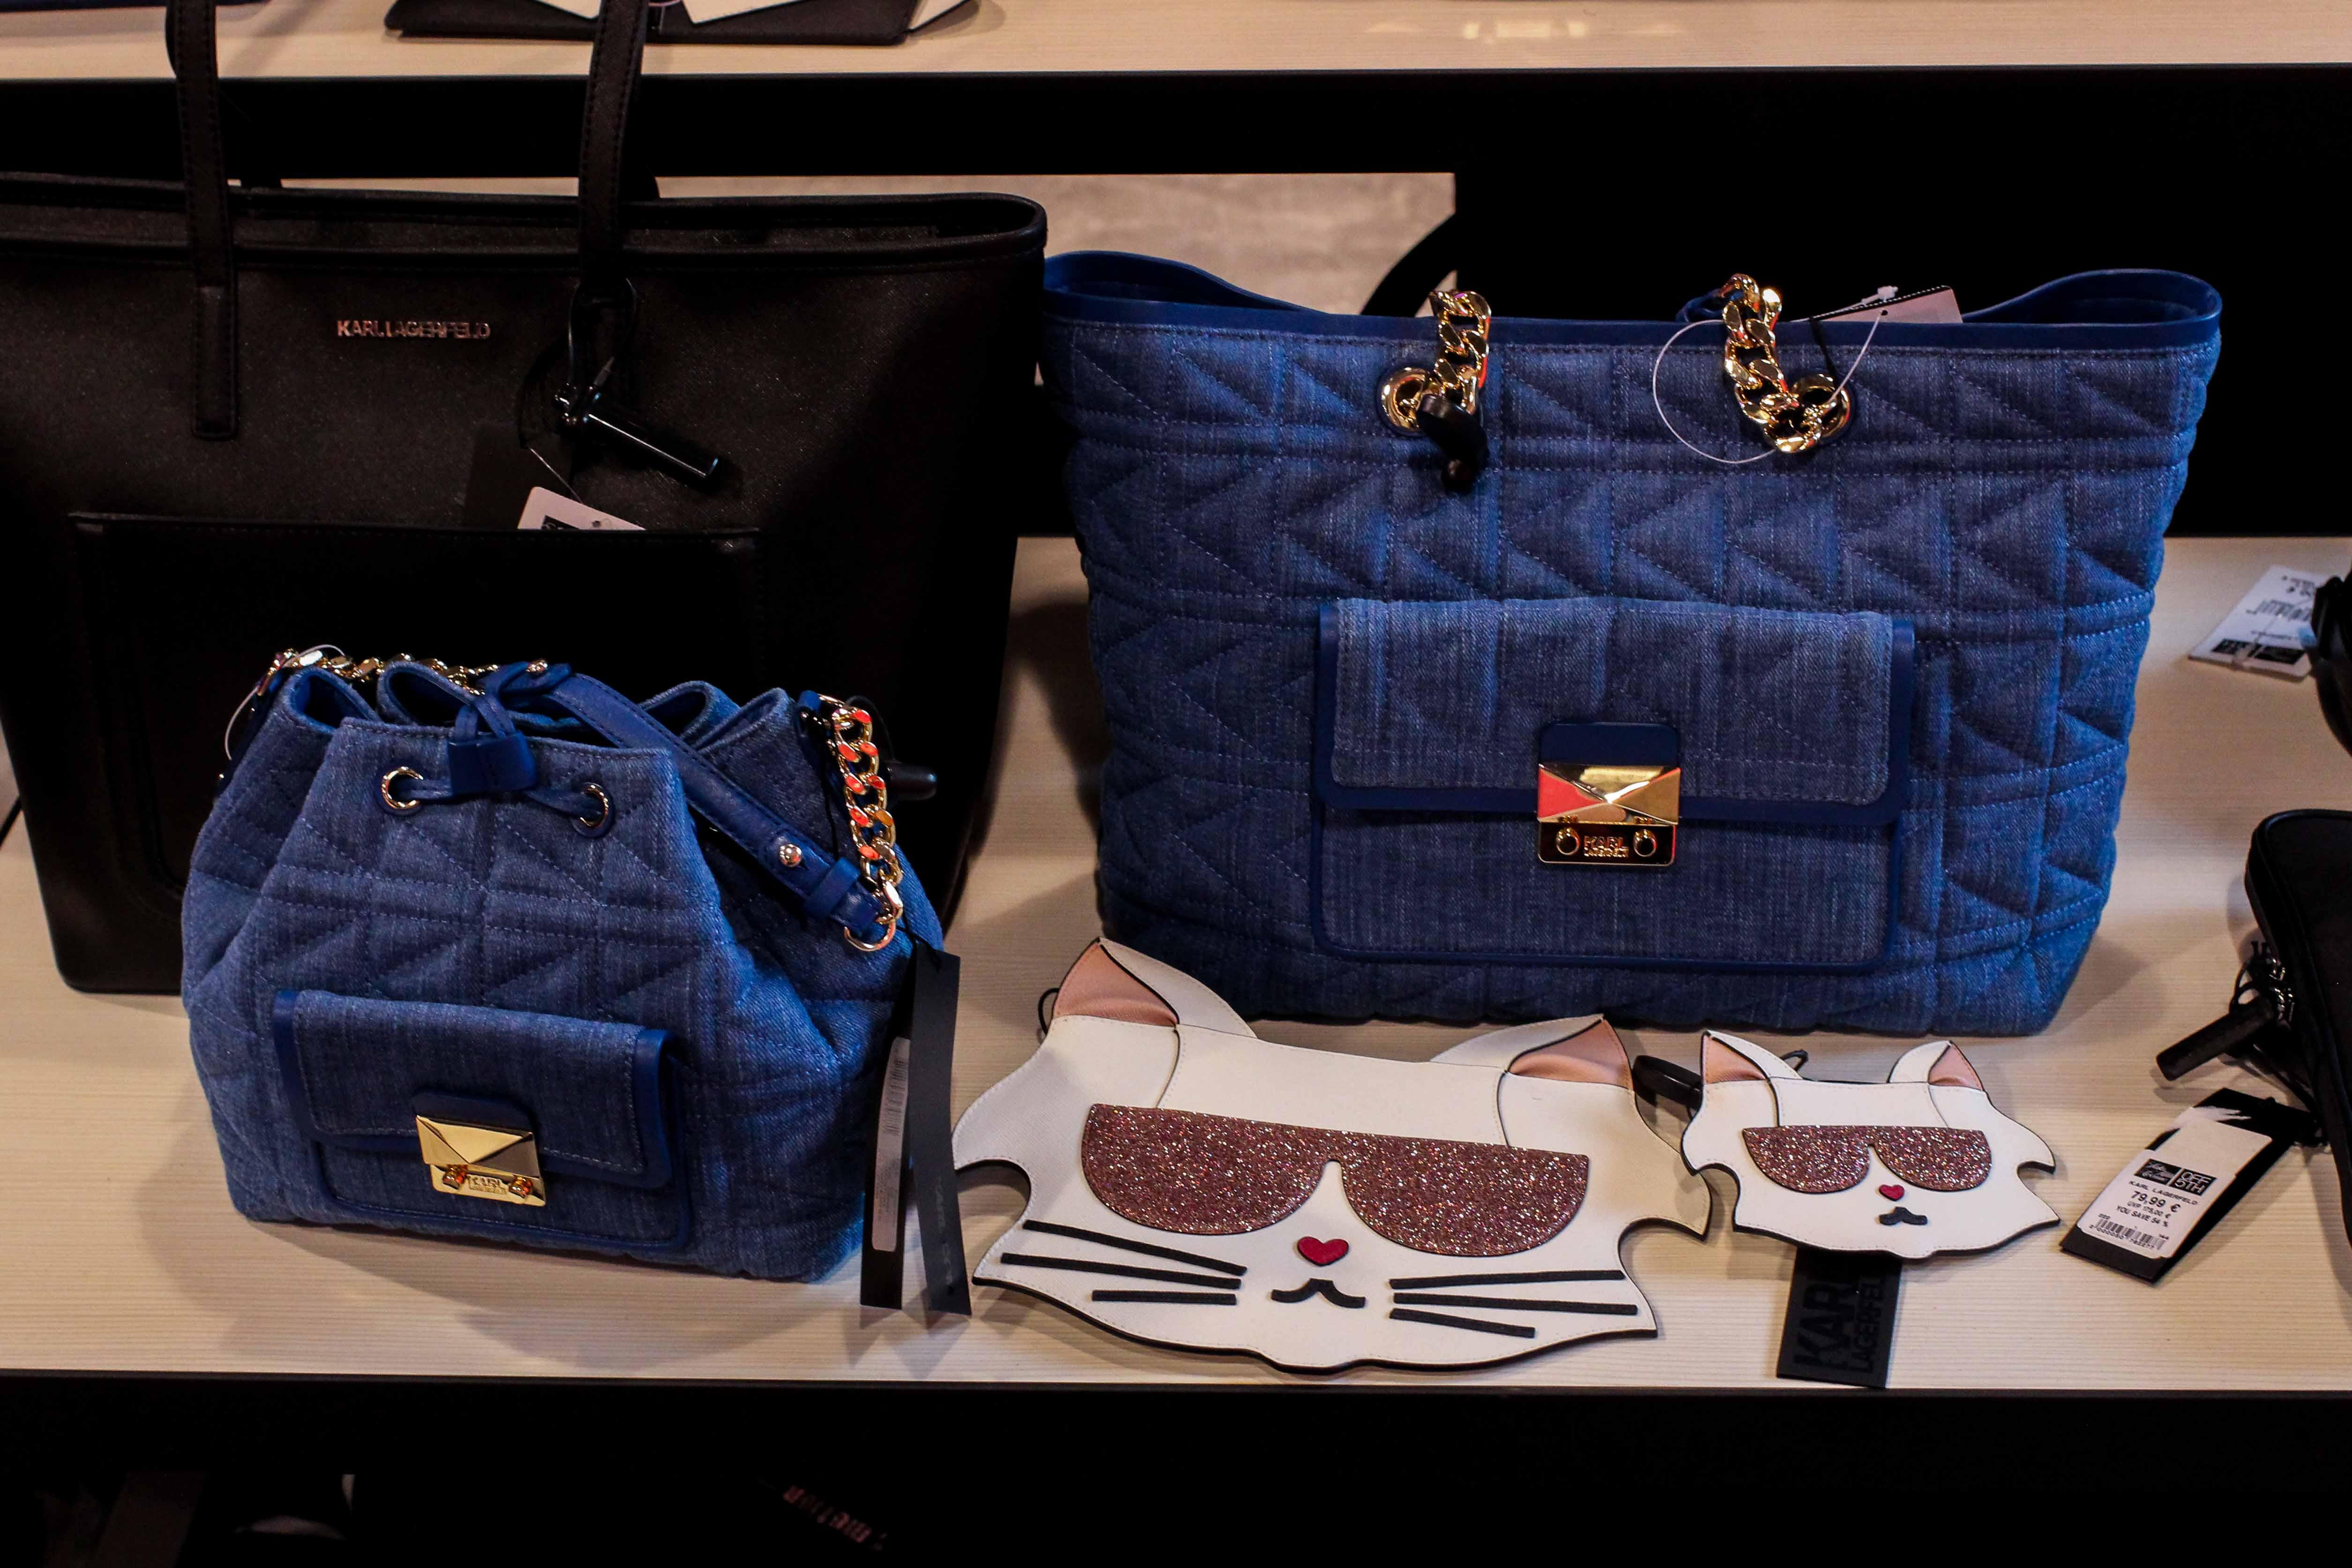 Karl Lagerfeld Taschen blau schwarz Store Opening Saks OFF 5th Avenue Bonn Premium-Marken Outletpreis Designer Outlet Bonn Modeblog